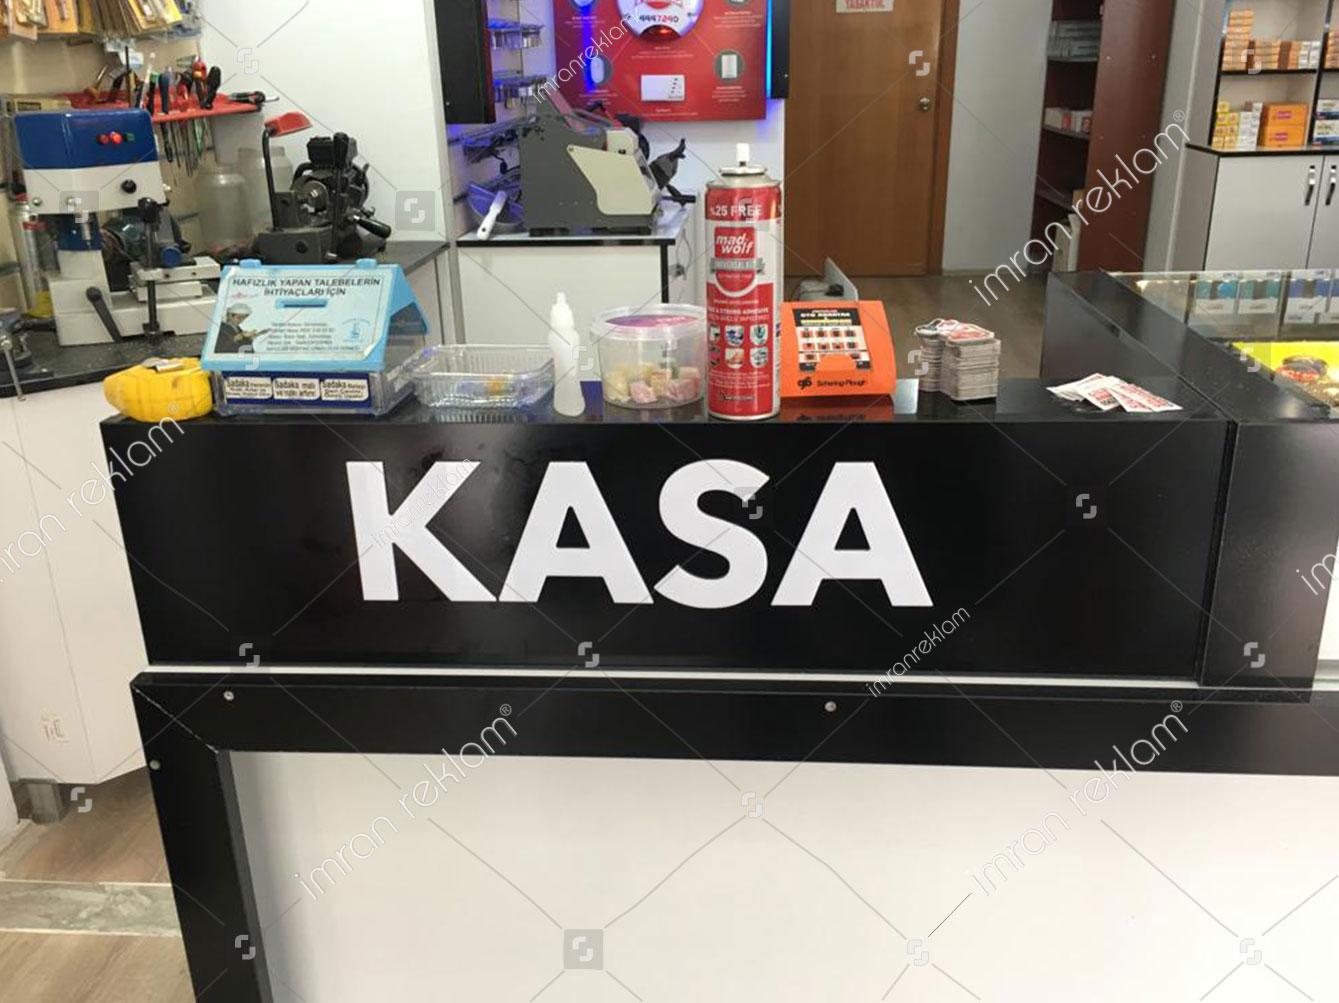 kasa-yazisi